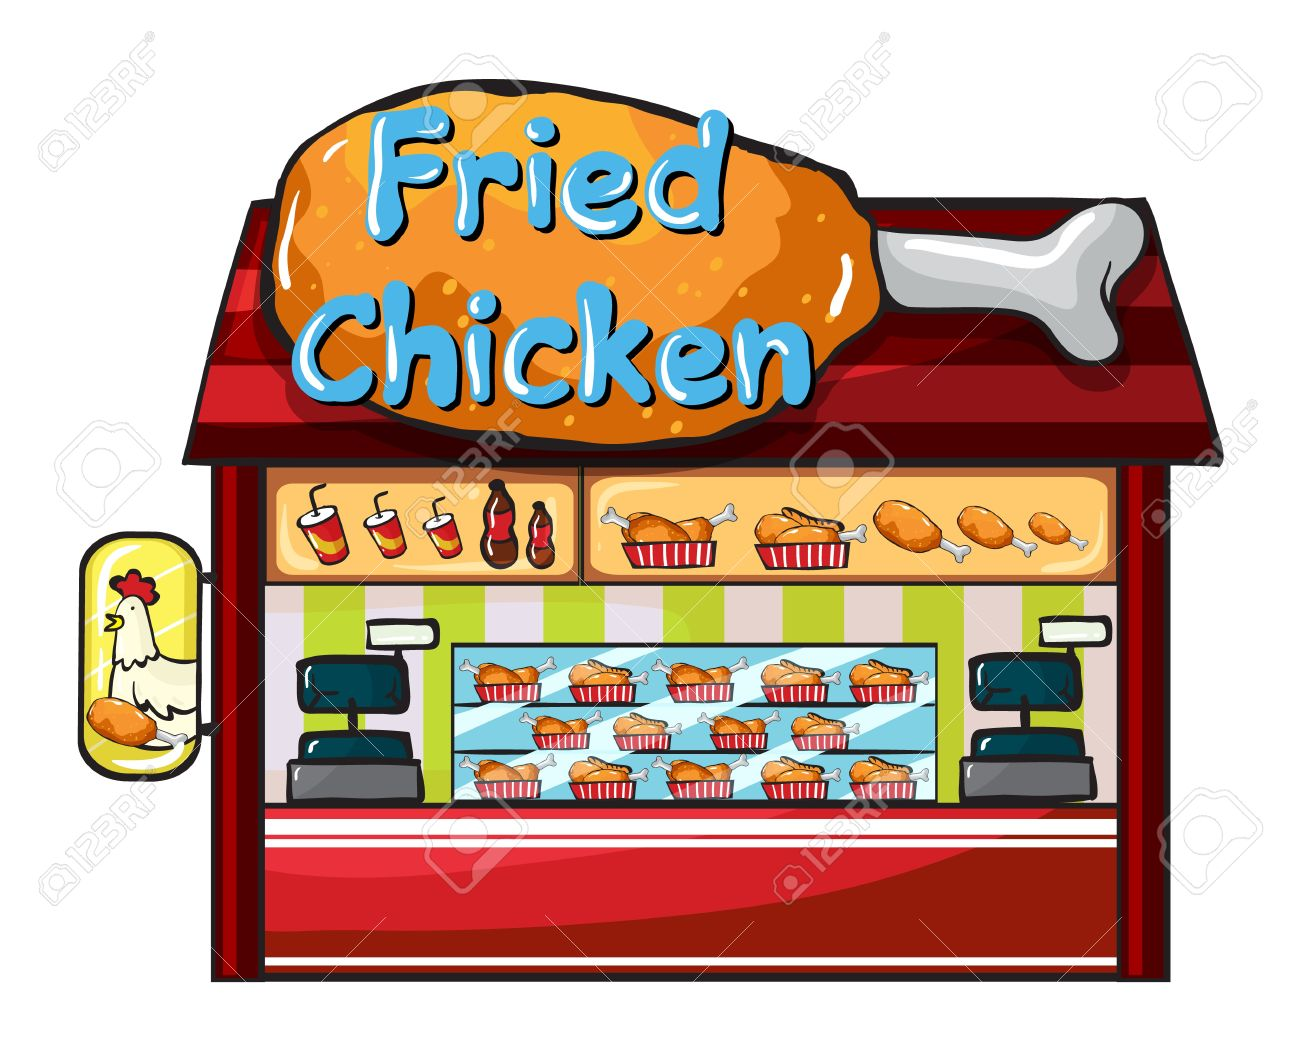 Fancy restaurant buildings clip art - Jpg 1300x1059 Fast Food Restaurant Backgrounds